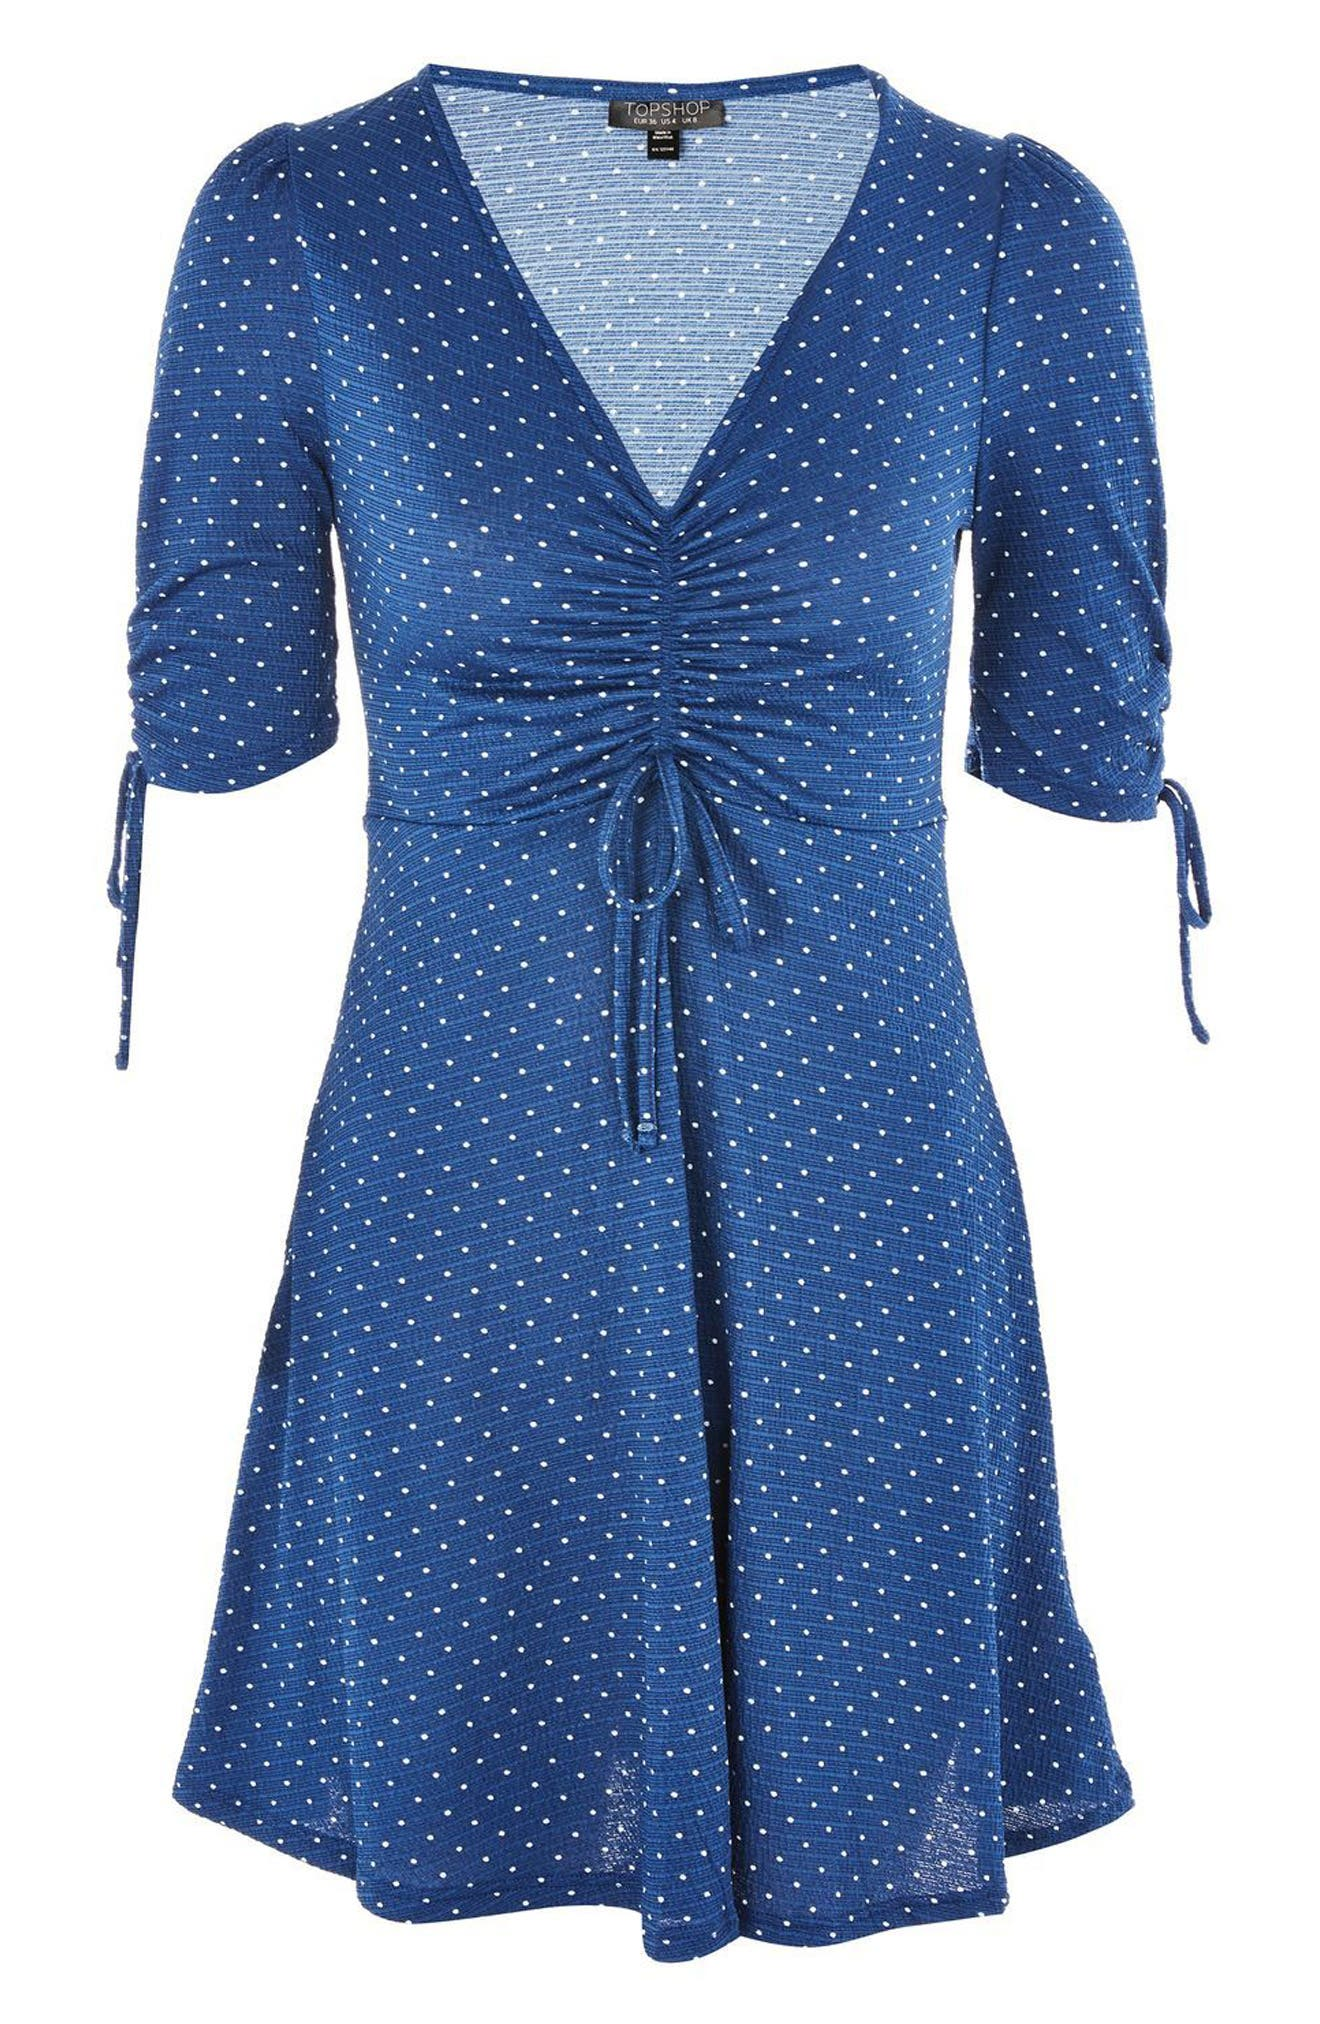 Polka Dot Tea Dress,                             Alternate thumbnail 3, color,